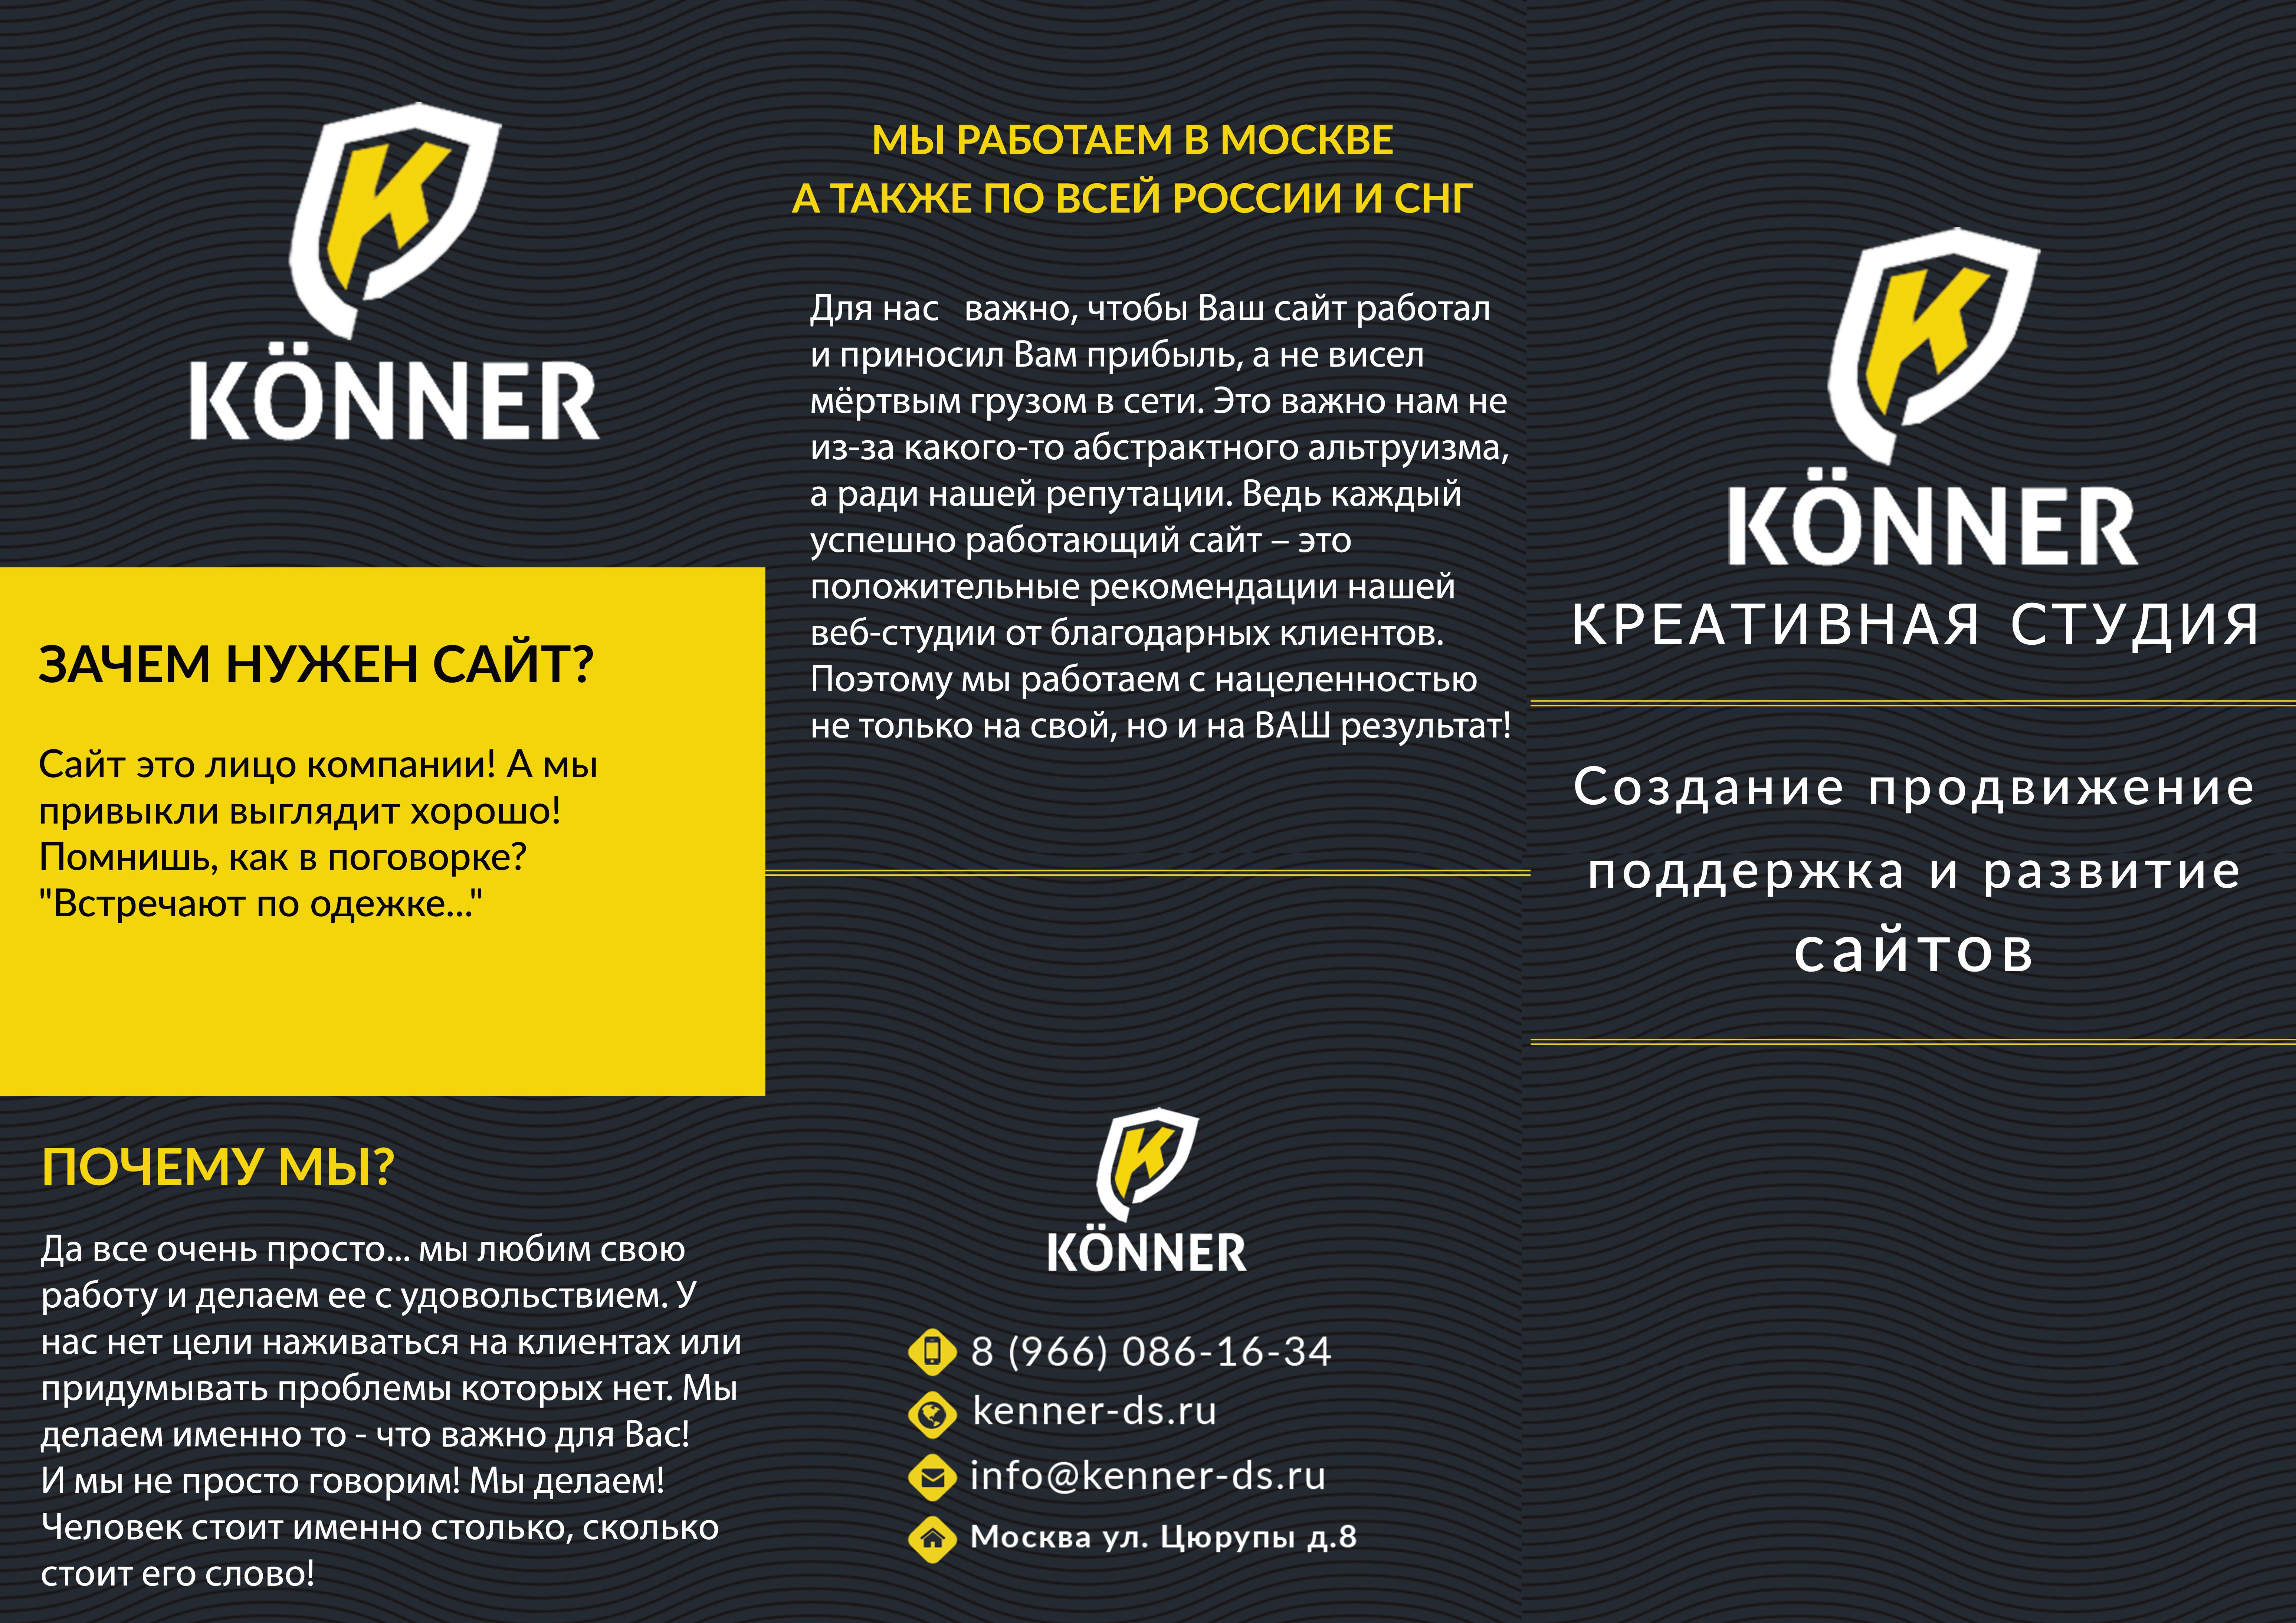 kenner дизайн студия в москве